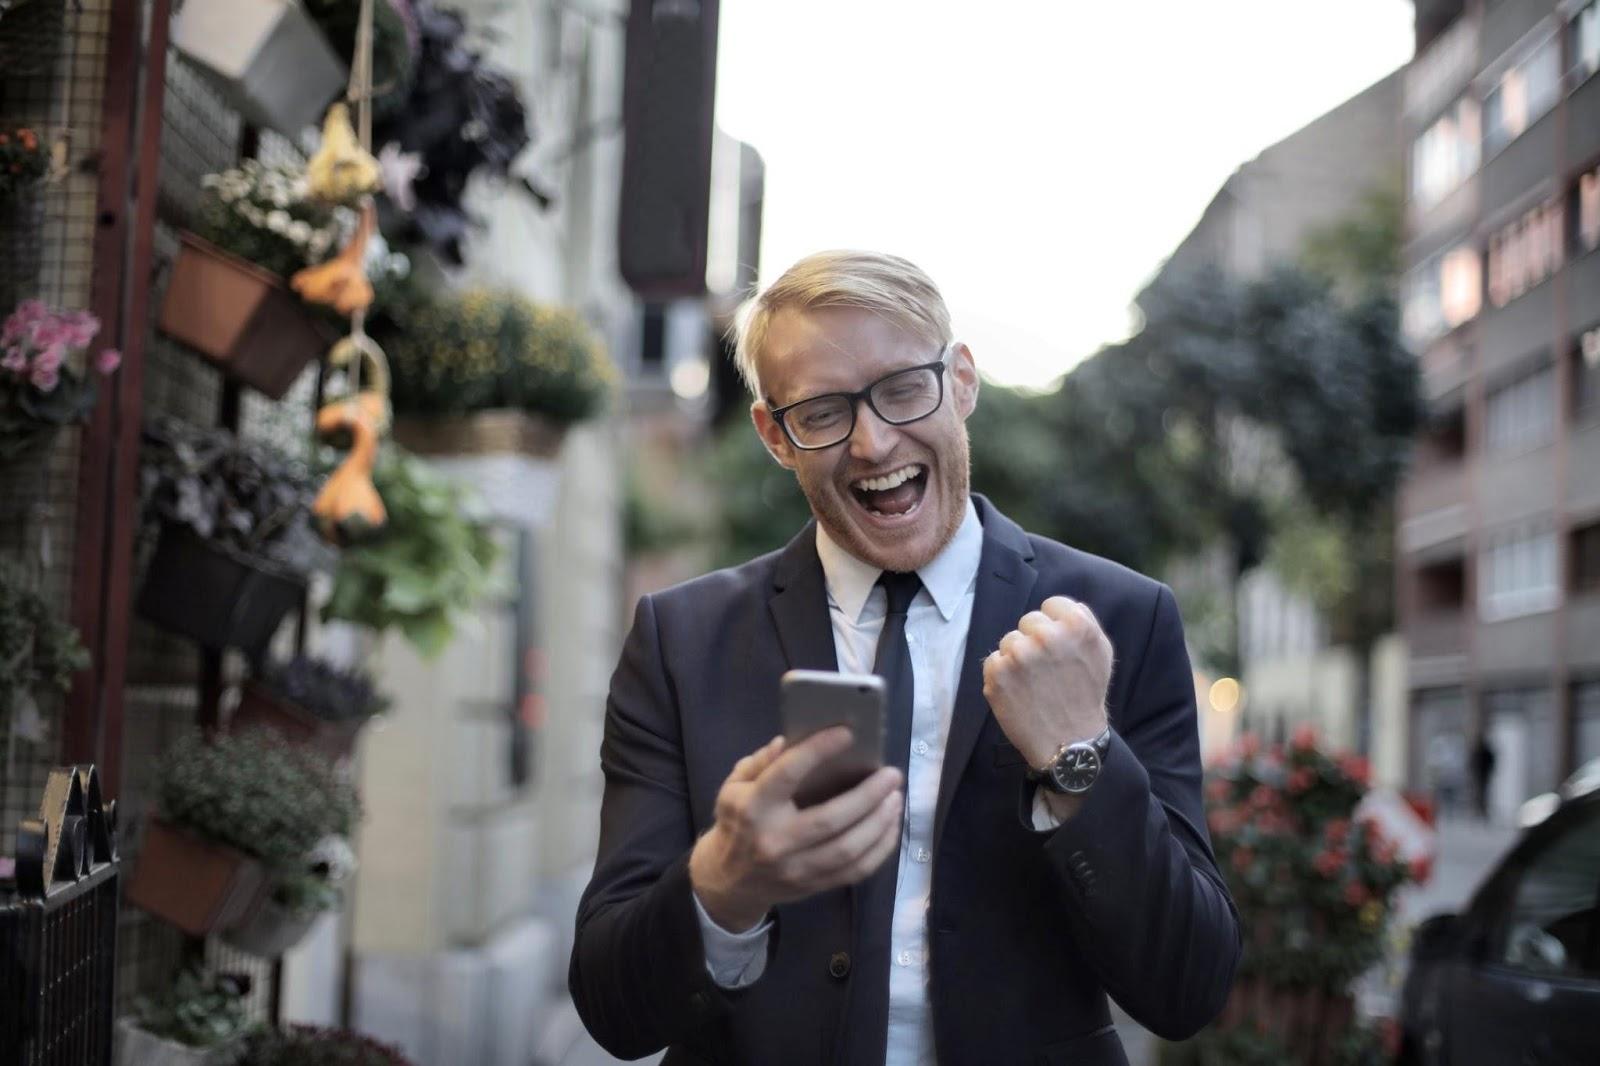 Businessman celebrating after receiving message on smartphone